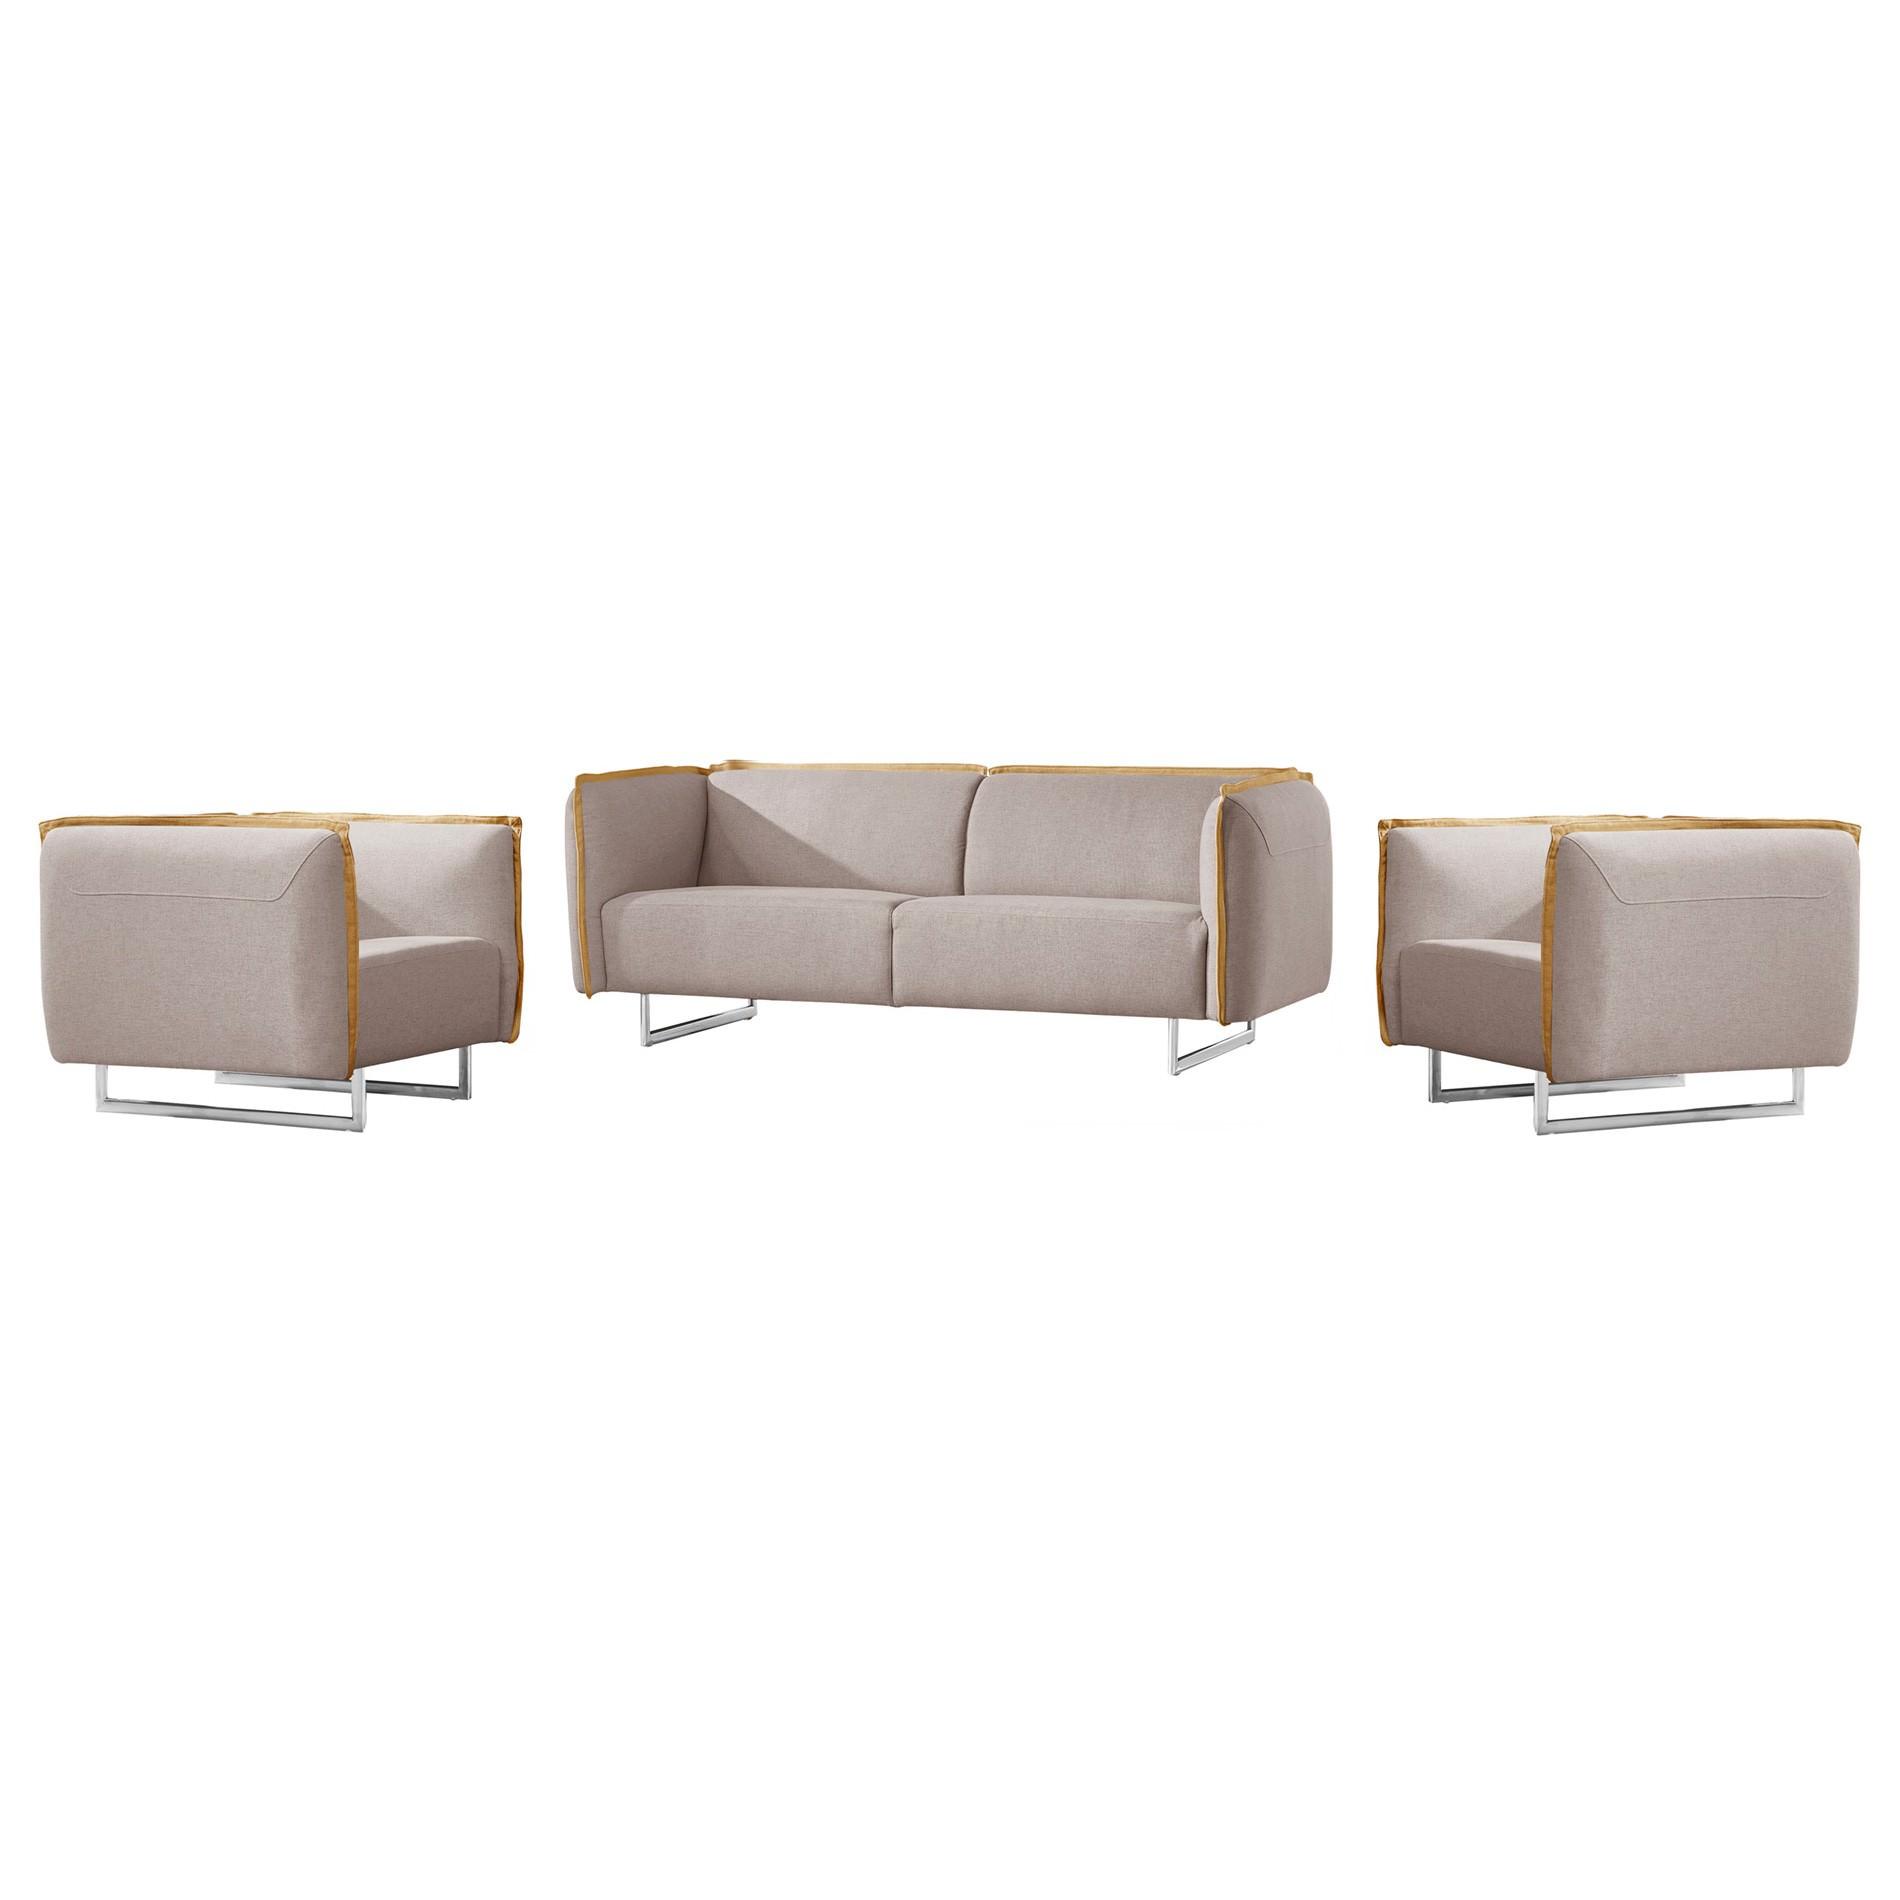 Peyton 3 Piece Fabric Sofa Set, 3+1+1 Seater, Light Grey